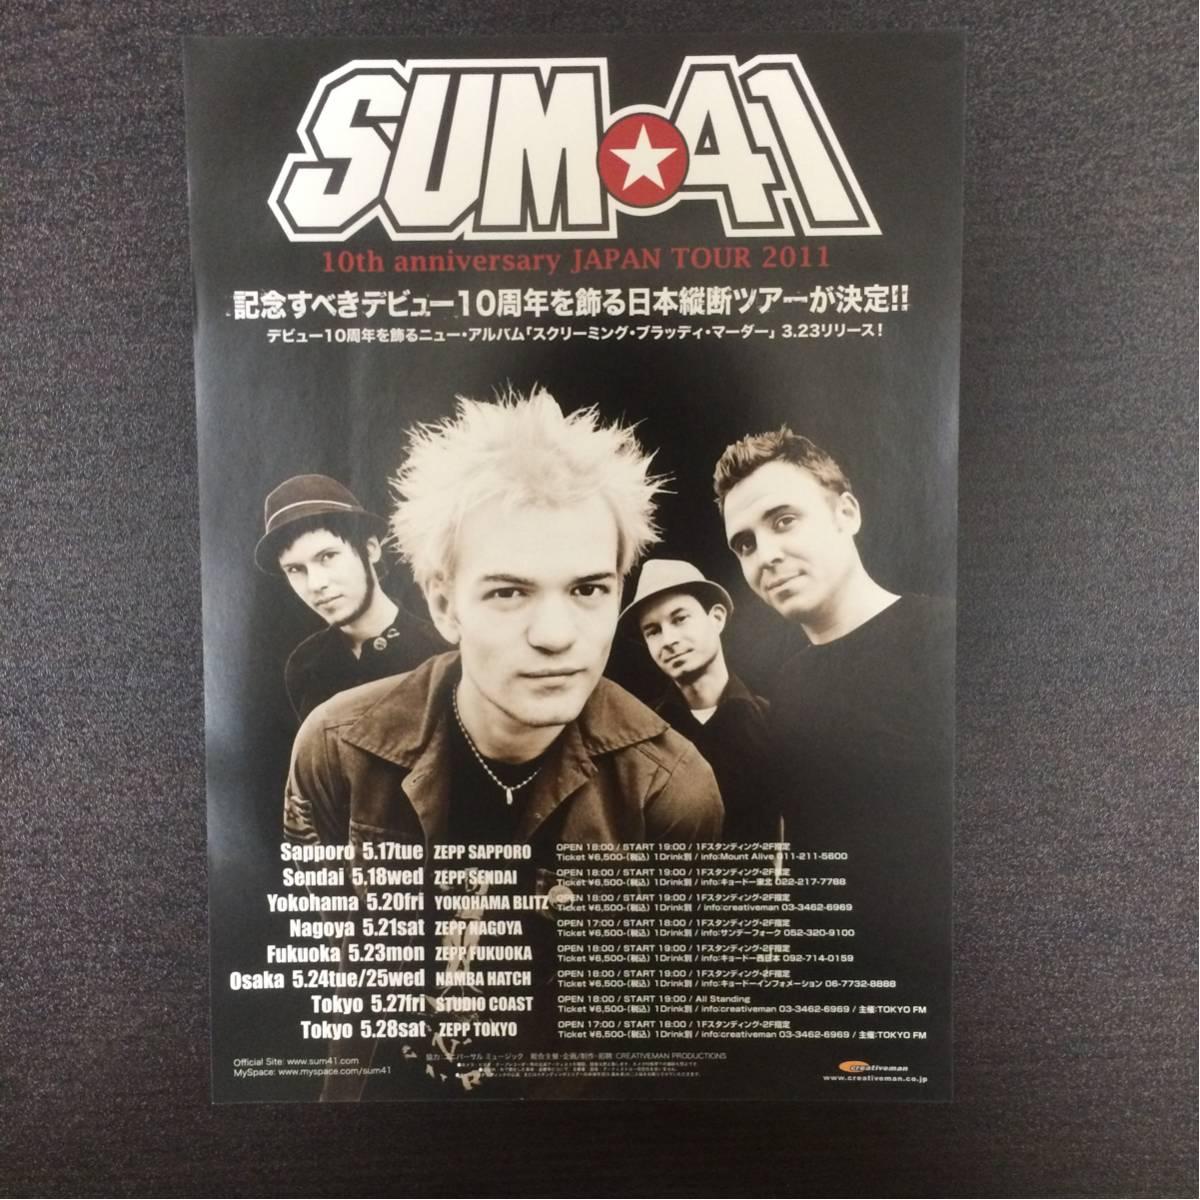 SUM41 JAPAN TOUR 2011 フライヤー